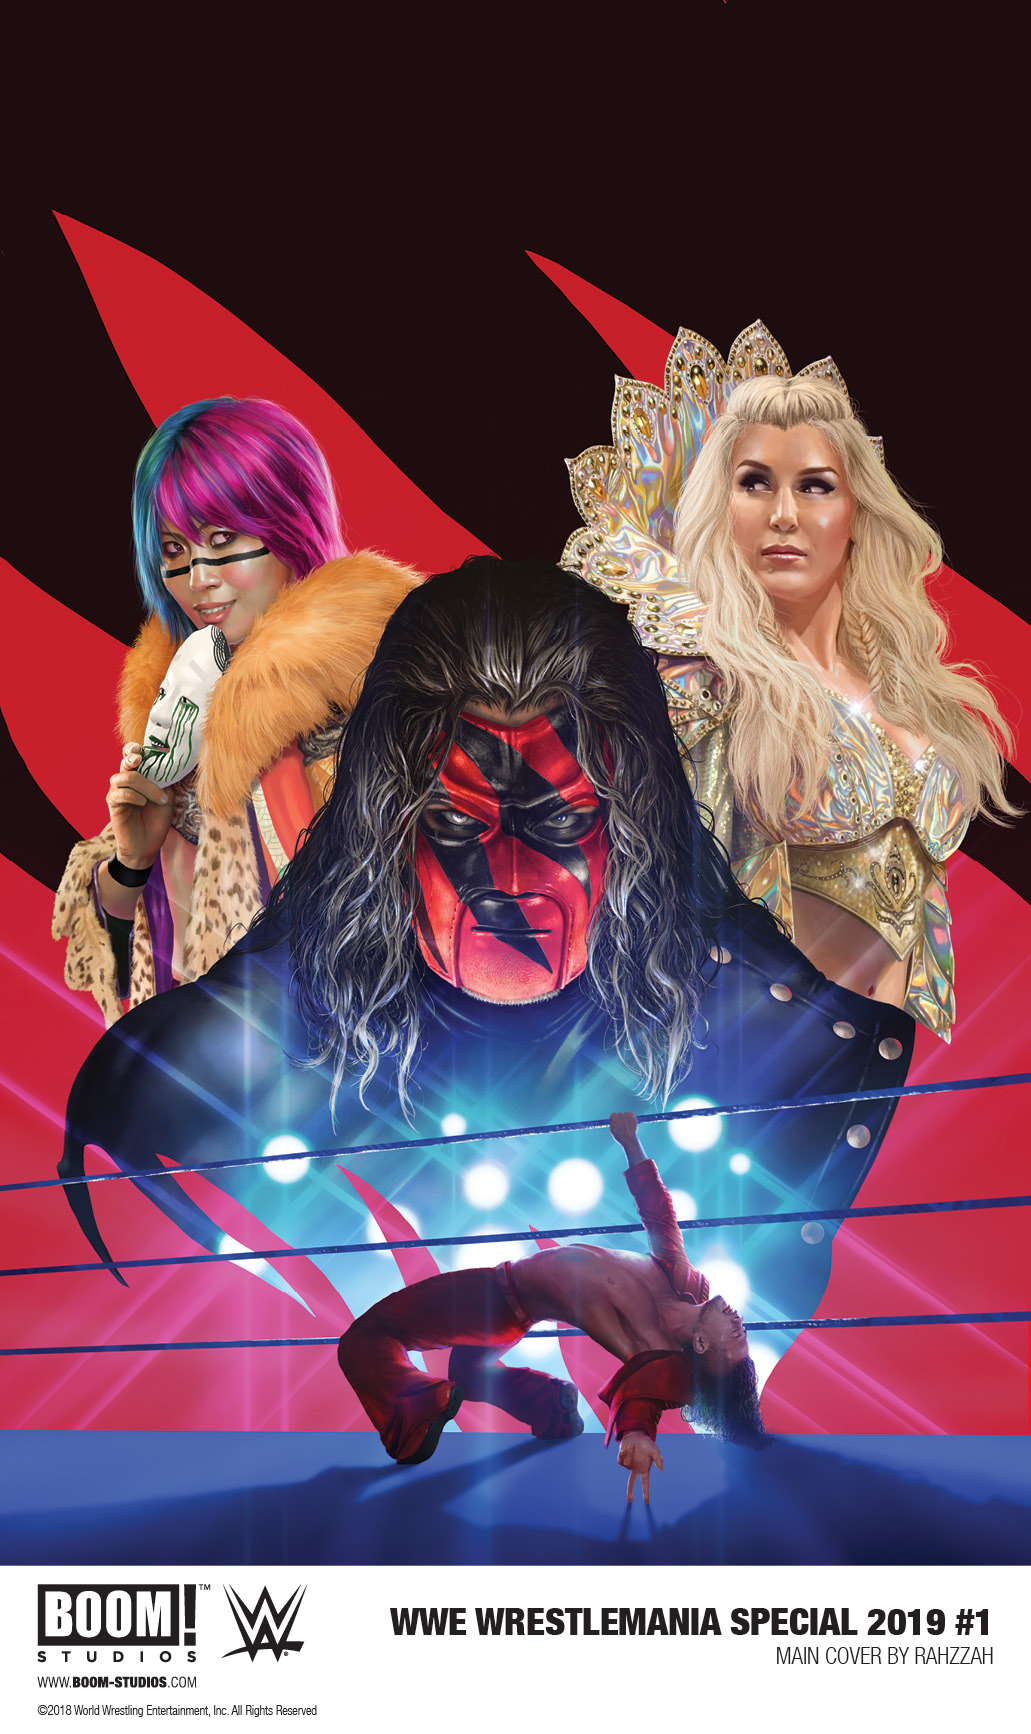 WWEWrestlemania_2019_001_Main_Rahzzah.jpg